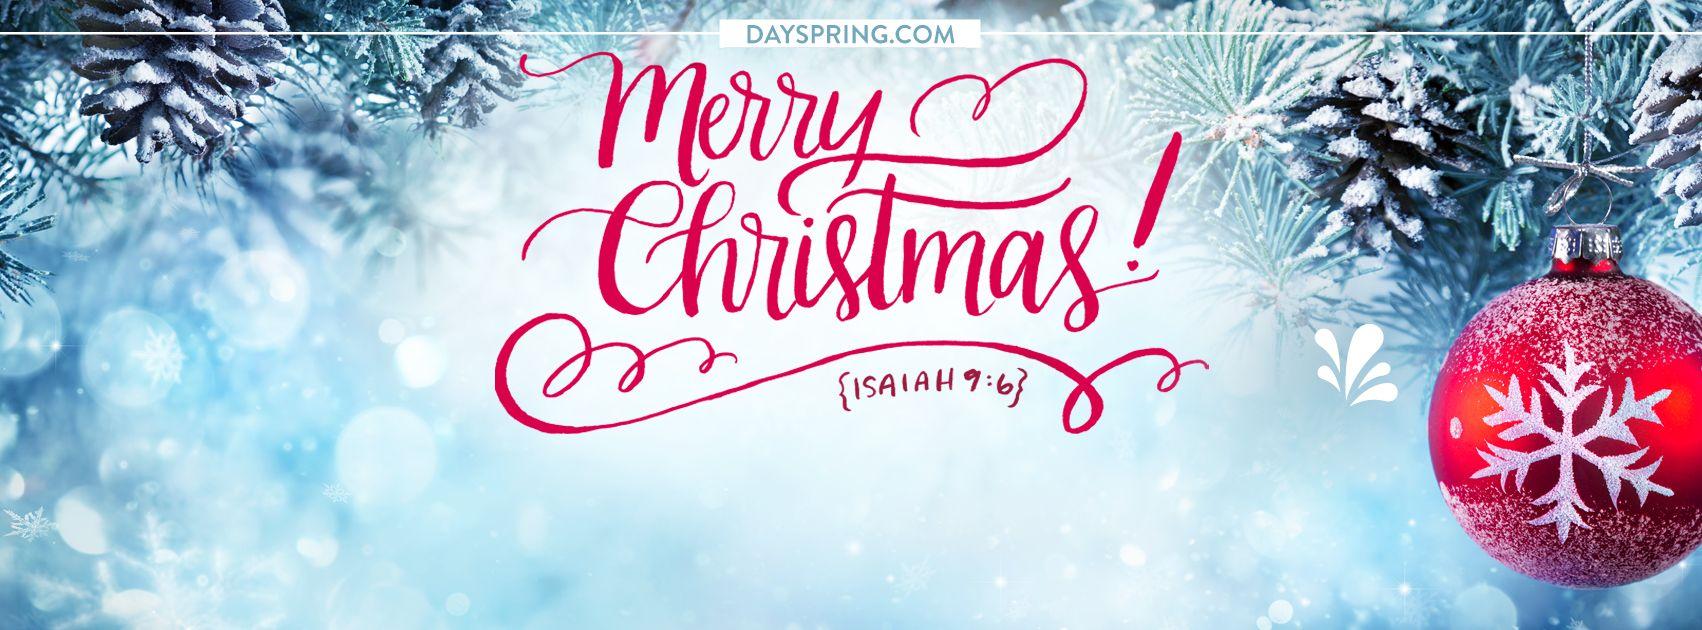 Pin by Nancy Heggemeier on FB Covers 1 | Christmas facebook cover ...